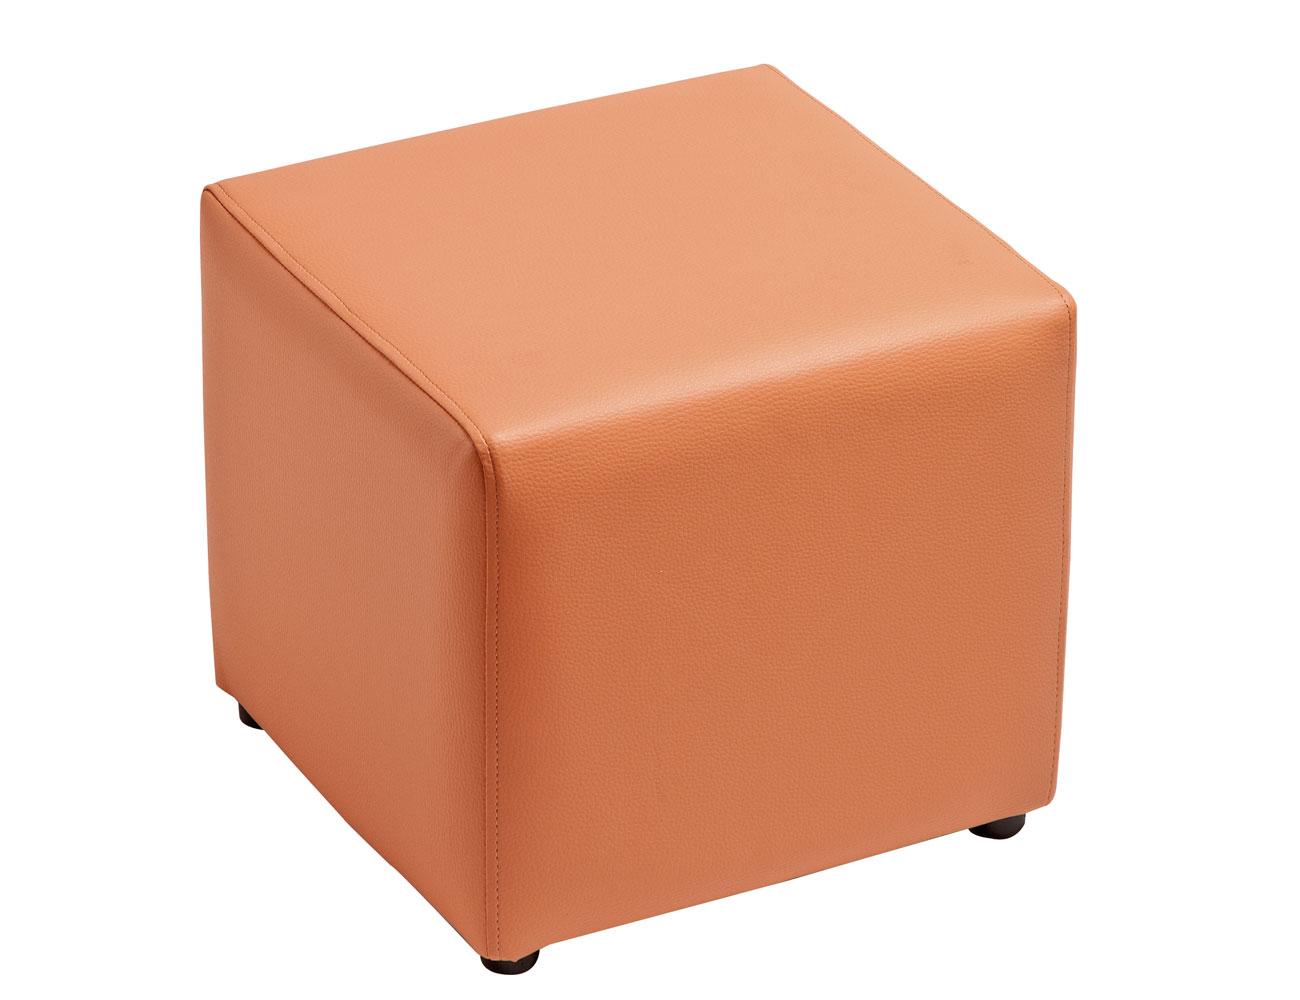 4 cuadrado fijo naranja2